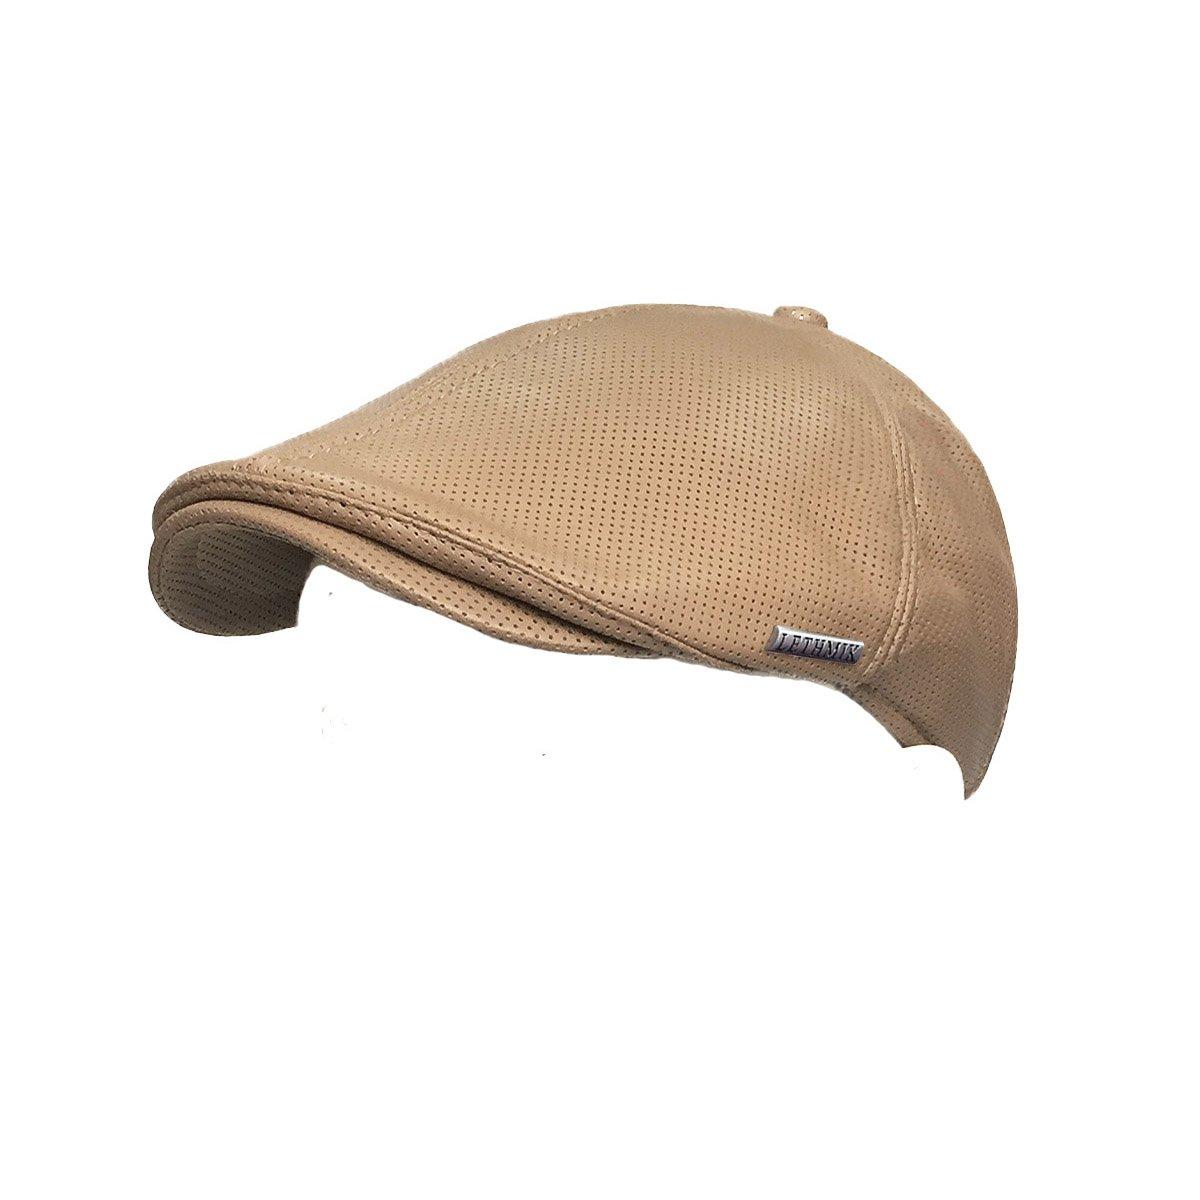 53745f15d7e87 LETHMIK Vintage Flat Hat Ivy Irish Hats Gatsby Newsboy Cap Cabbie Hat  Stretch Beige Holes at Amazon Men s Clothing store